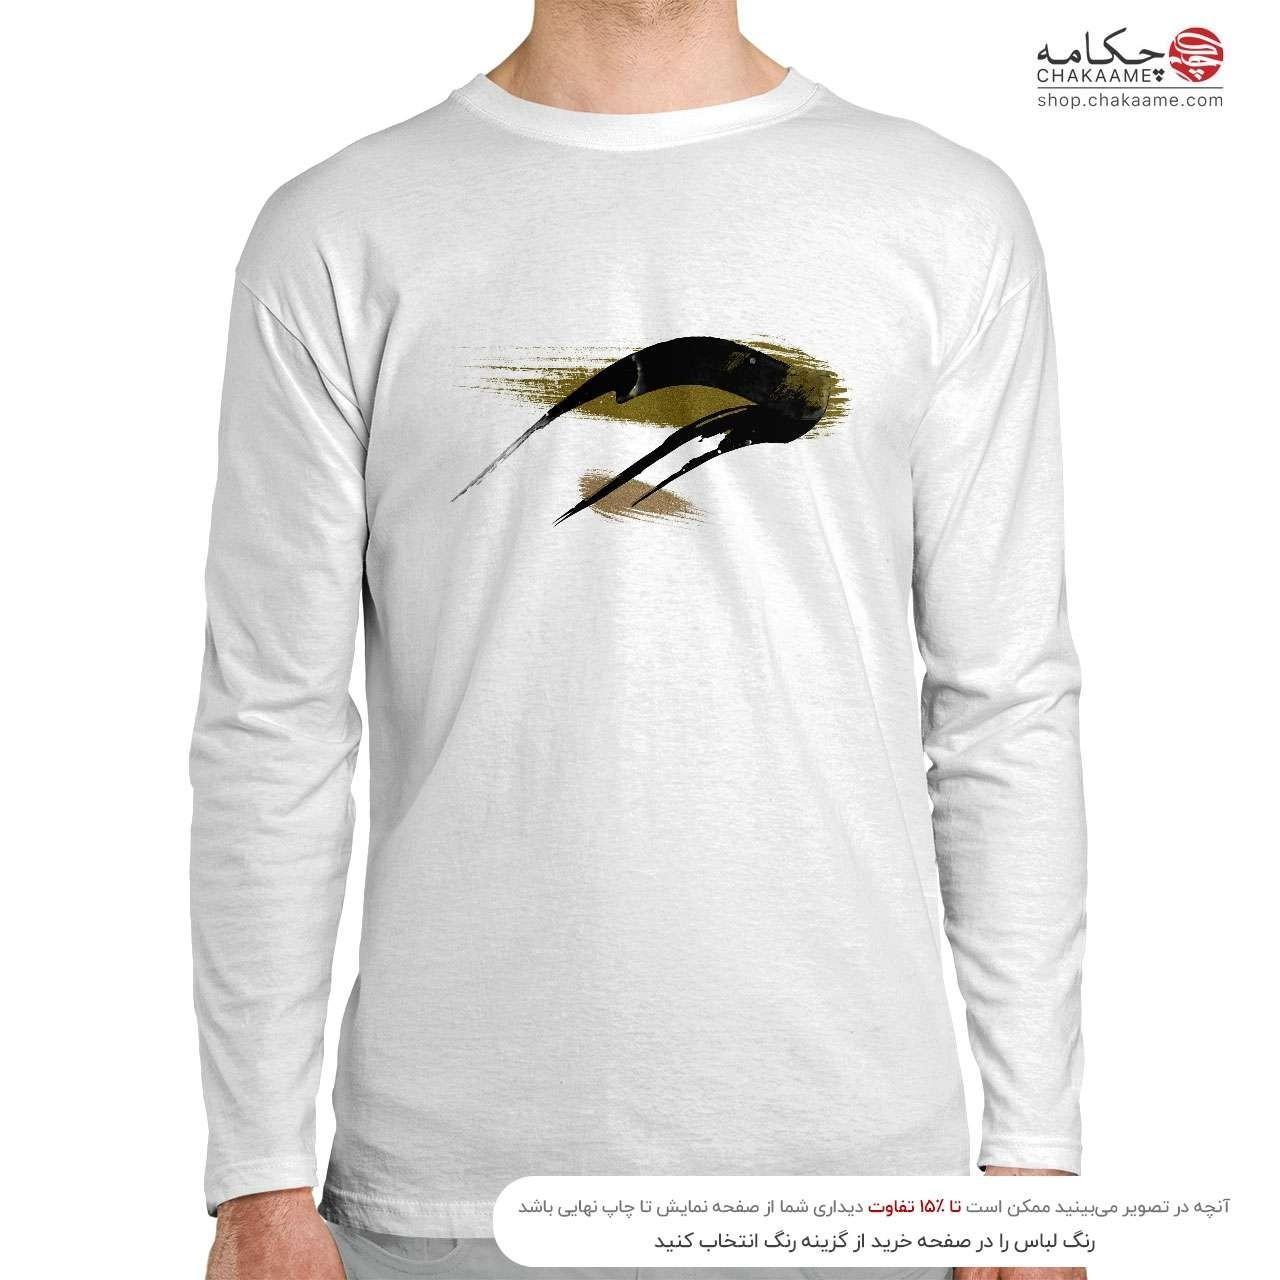 تیشرت آستین بلند - طرح خوشنویسی فارسی...